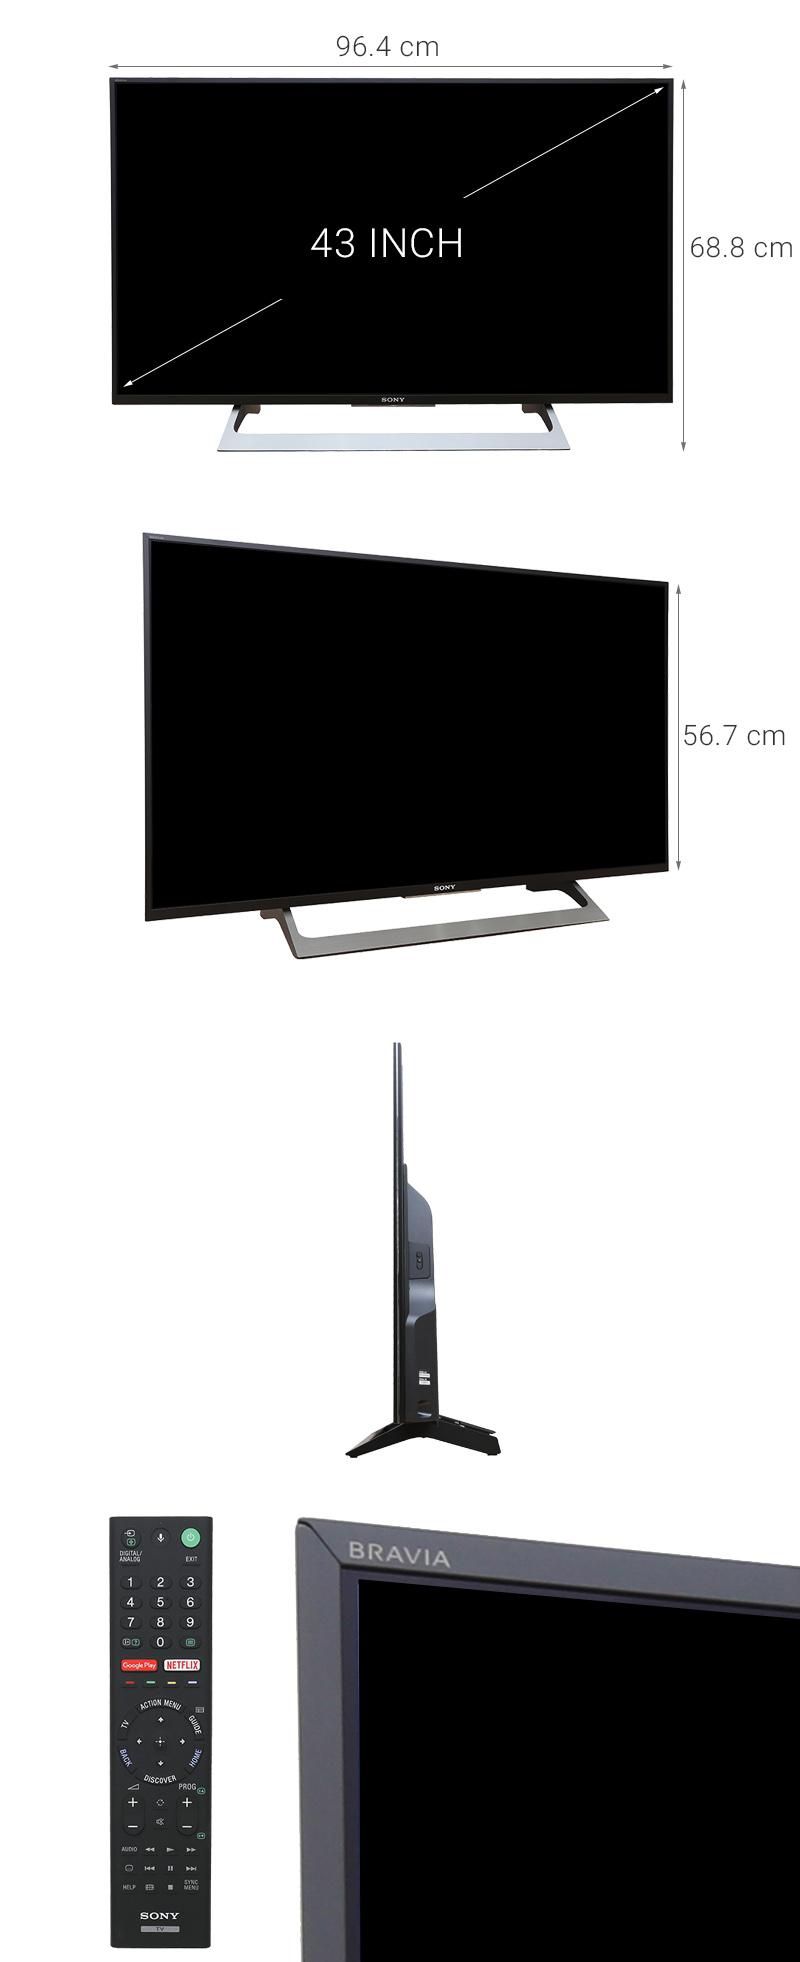 Android Tivi Sony 43 inch KD-43X8000E - Kích thước TV